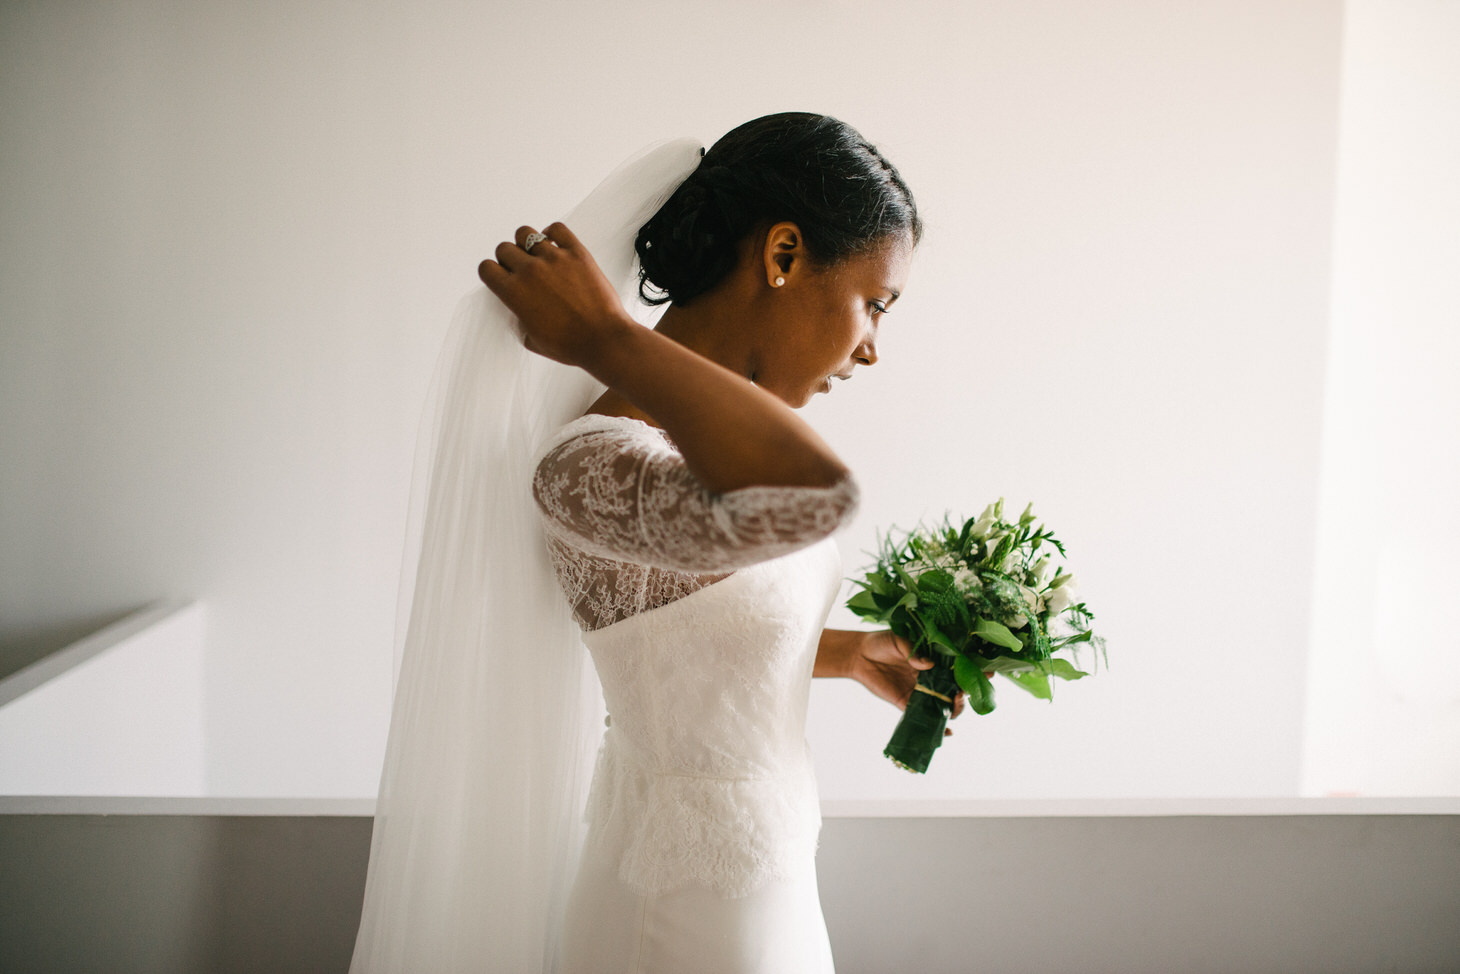 photographe-mariage-lyon-0206